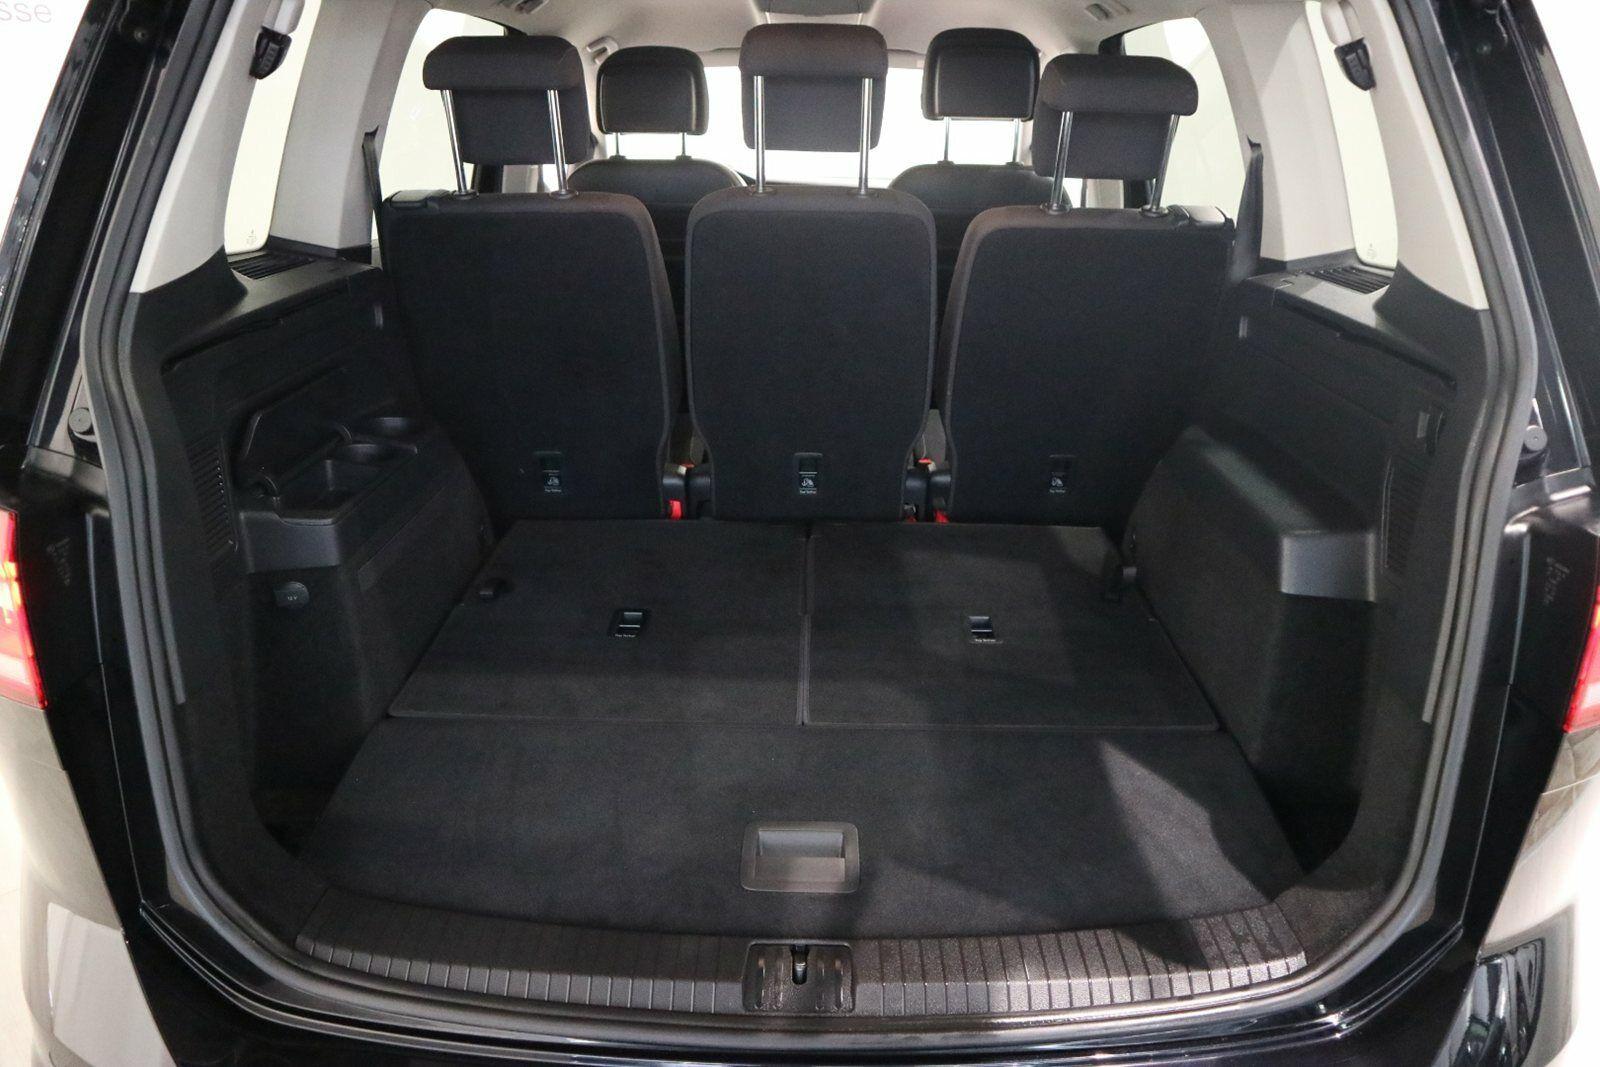 VW Touran 1,4 TSi 150 Comfortline DSG 7prs - billede 11